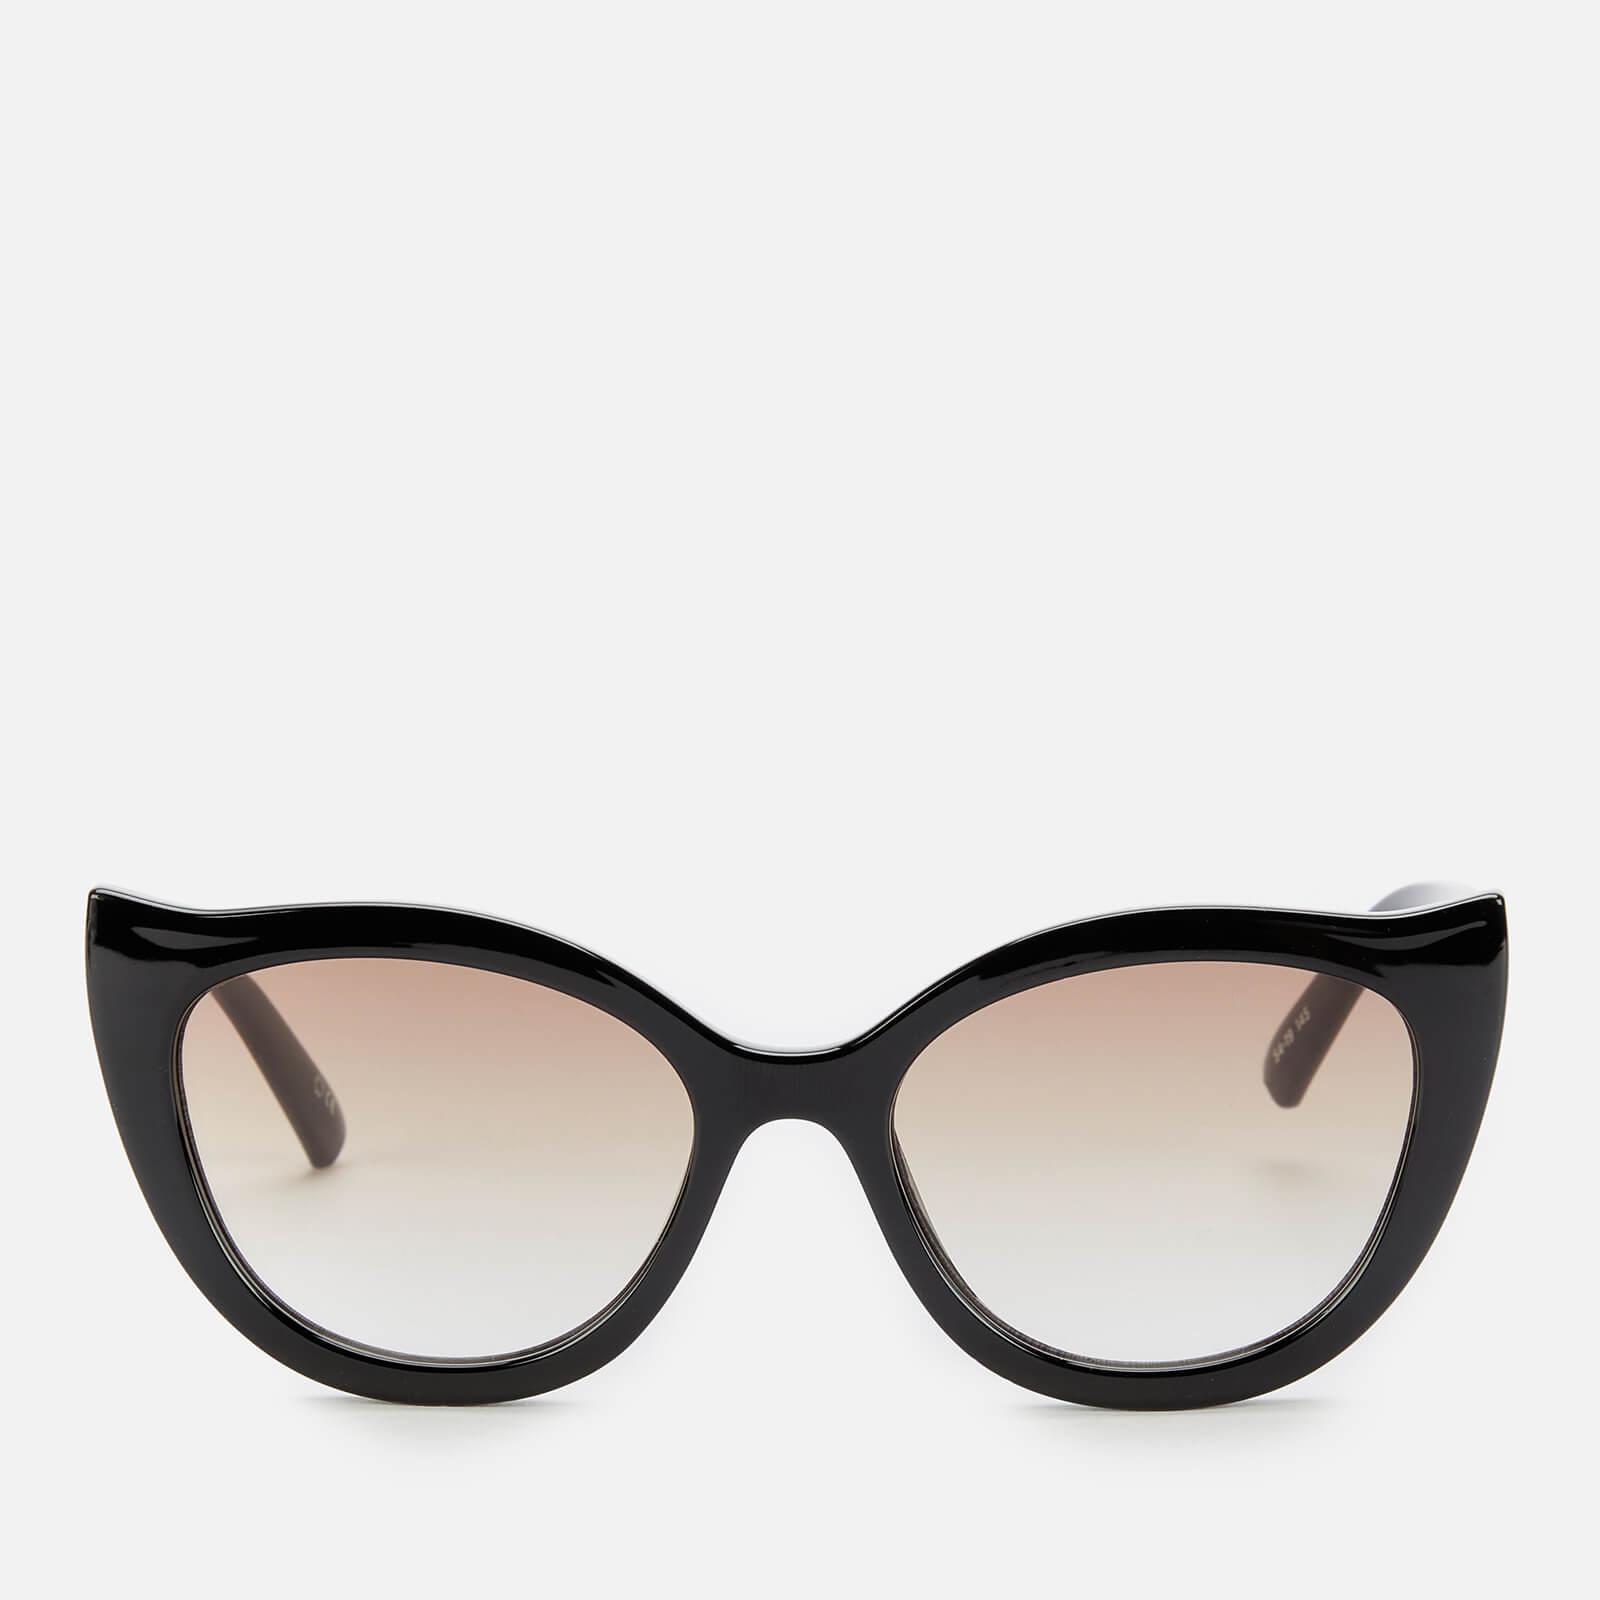 Le Specs Women's Flossy Cat Eye Sunglasses - Black